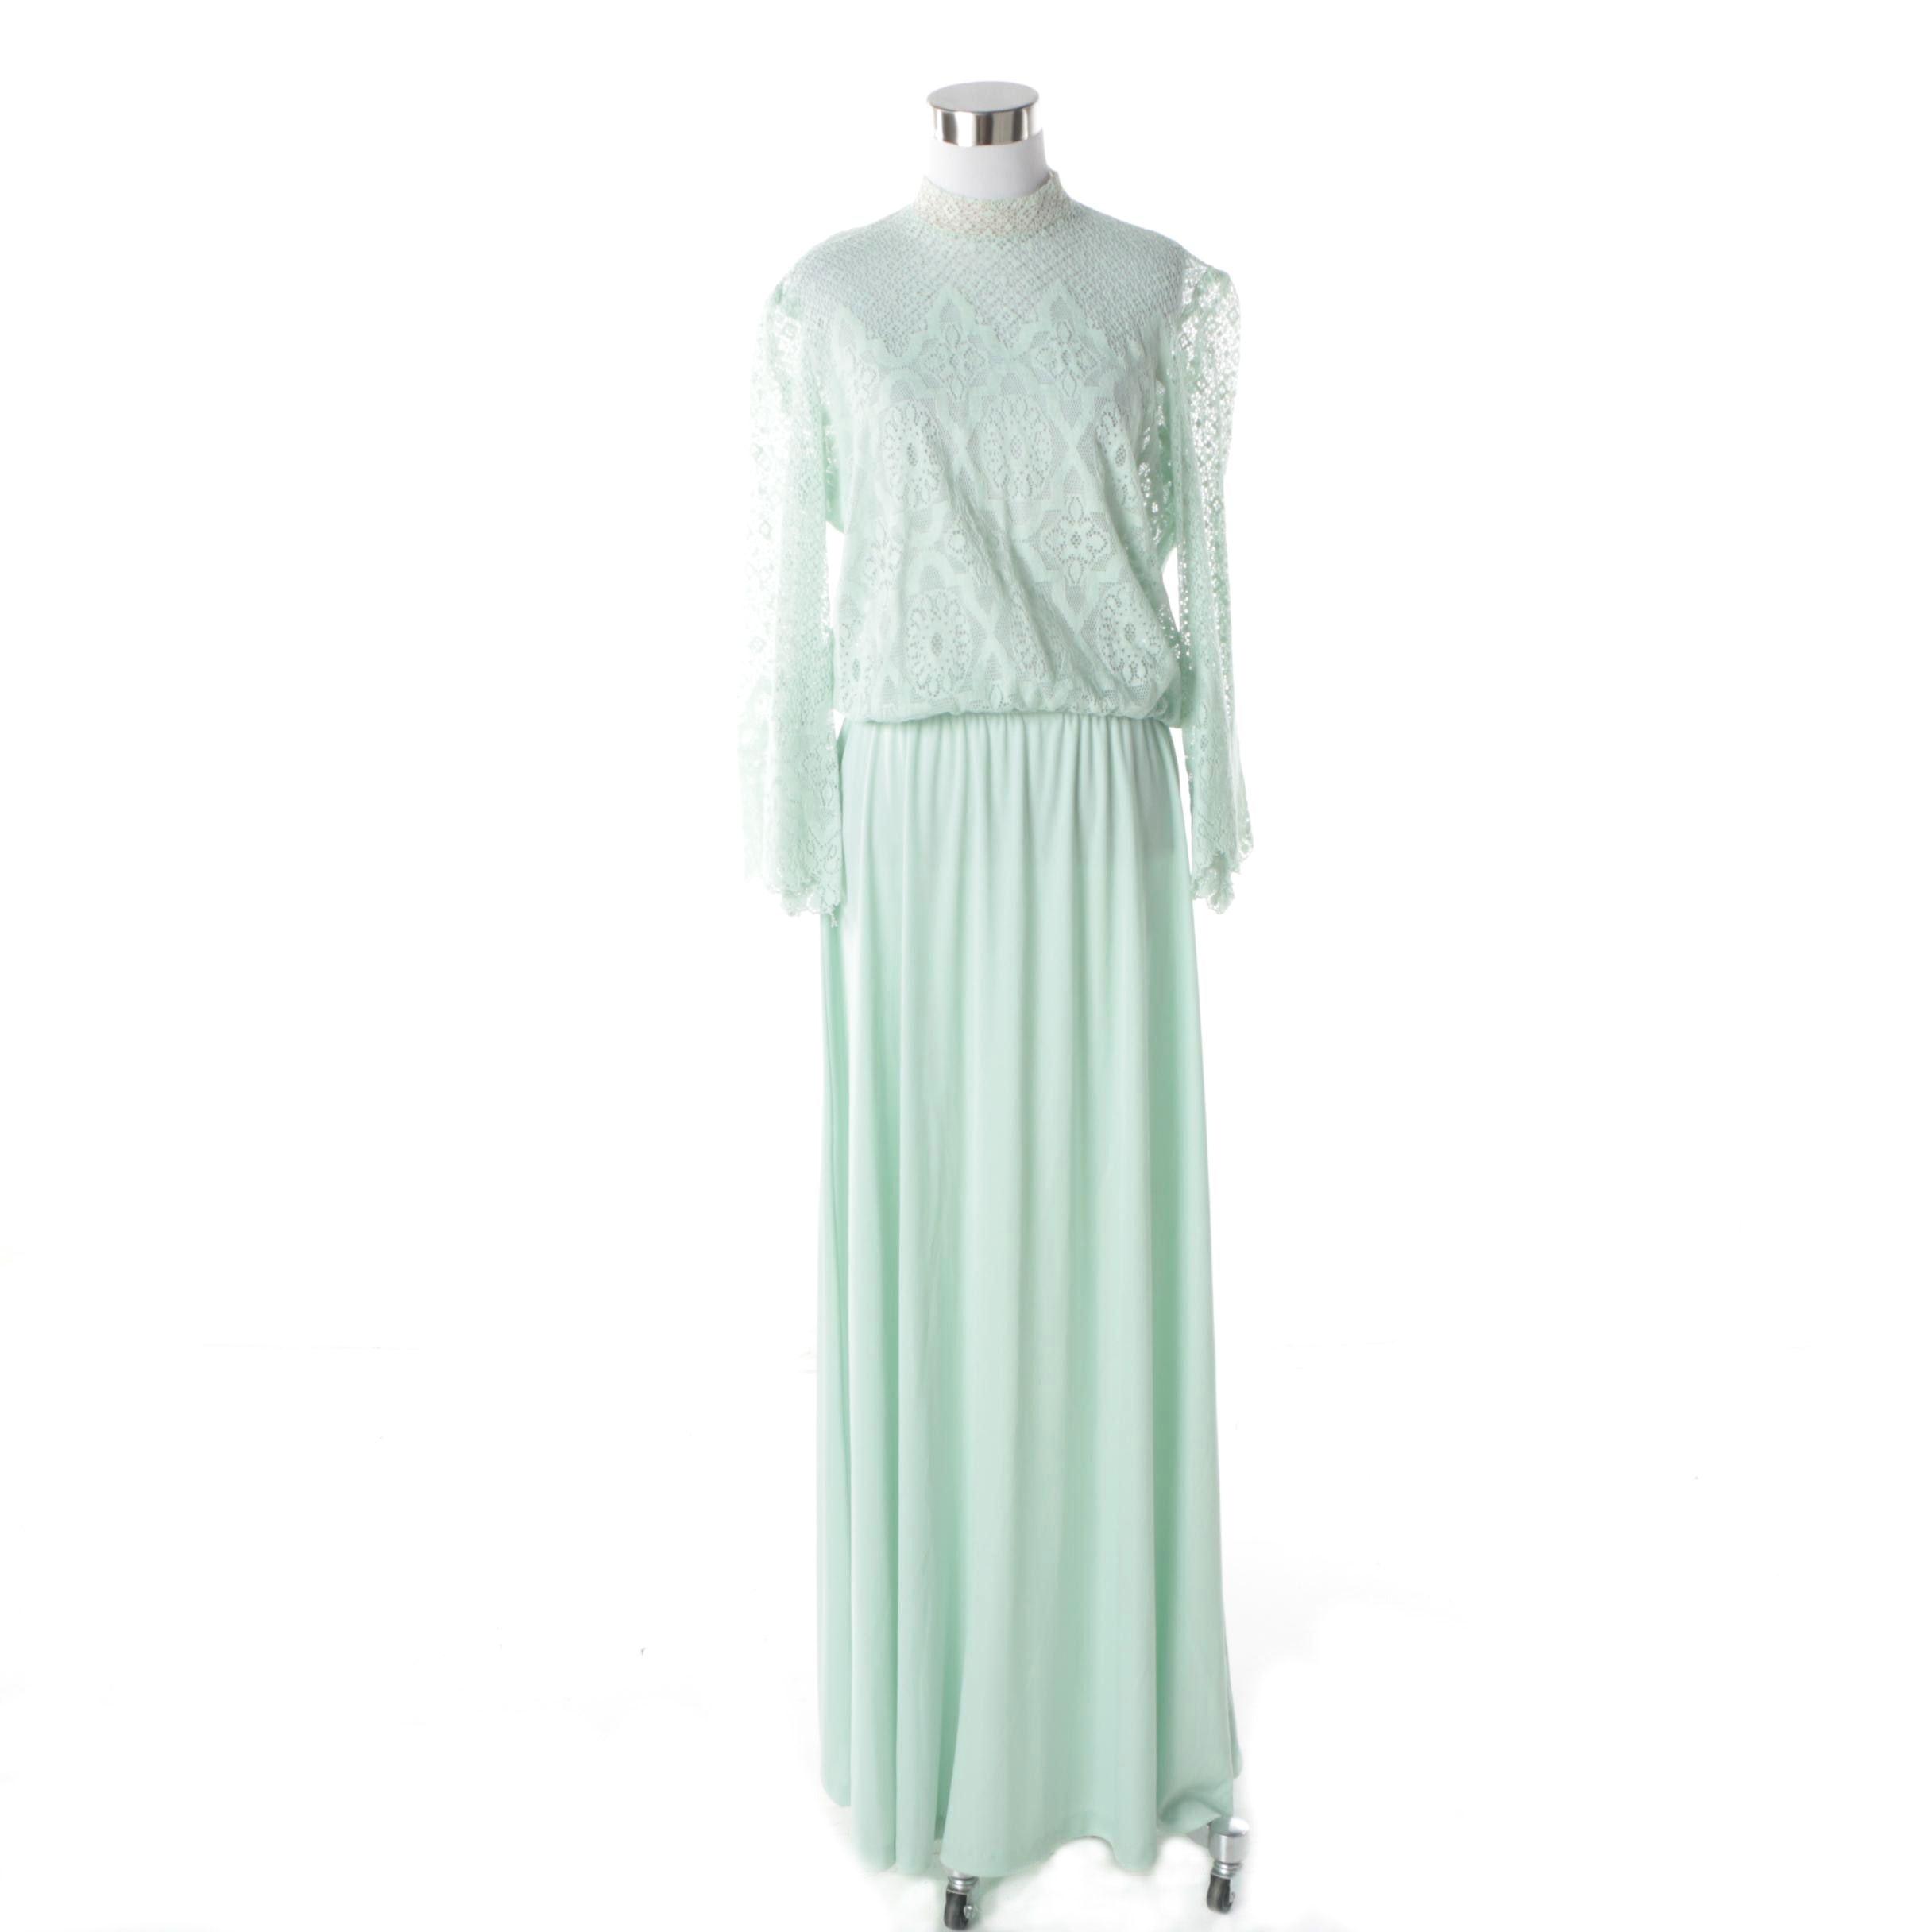 1970s Vintage Lilli Diamond Aqua Lace Bell Sleeve Blouse and Maxi Skirt Set